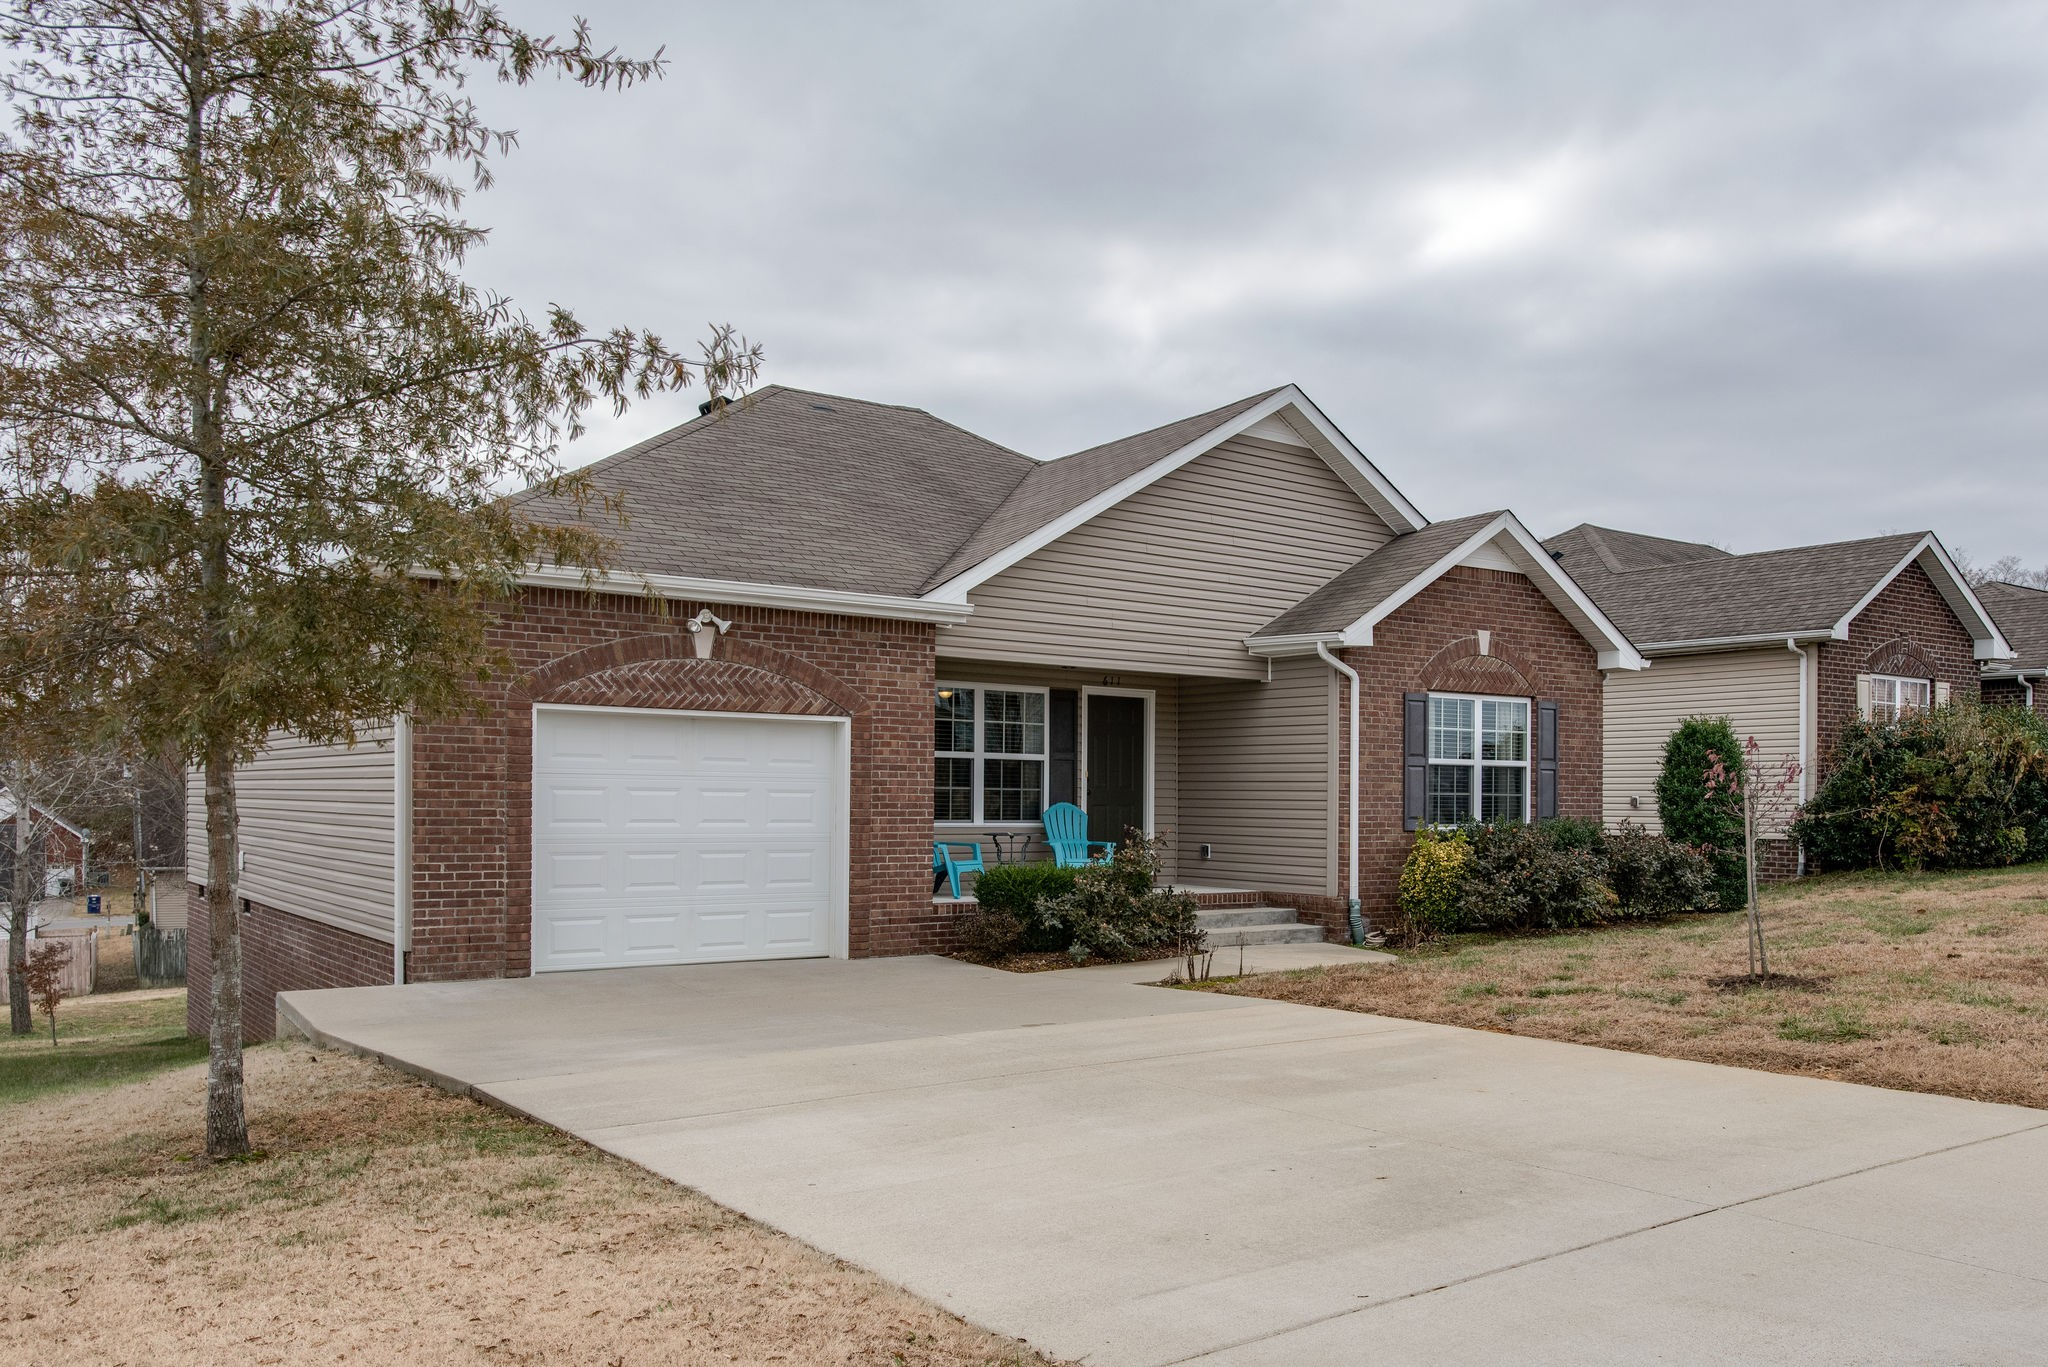 611 Berry Cir, Springfield, TN 37172 - Springfield, TN real estate listing